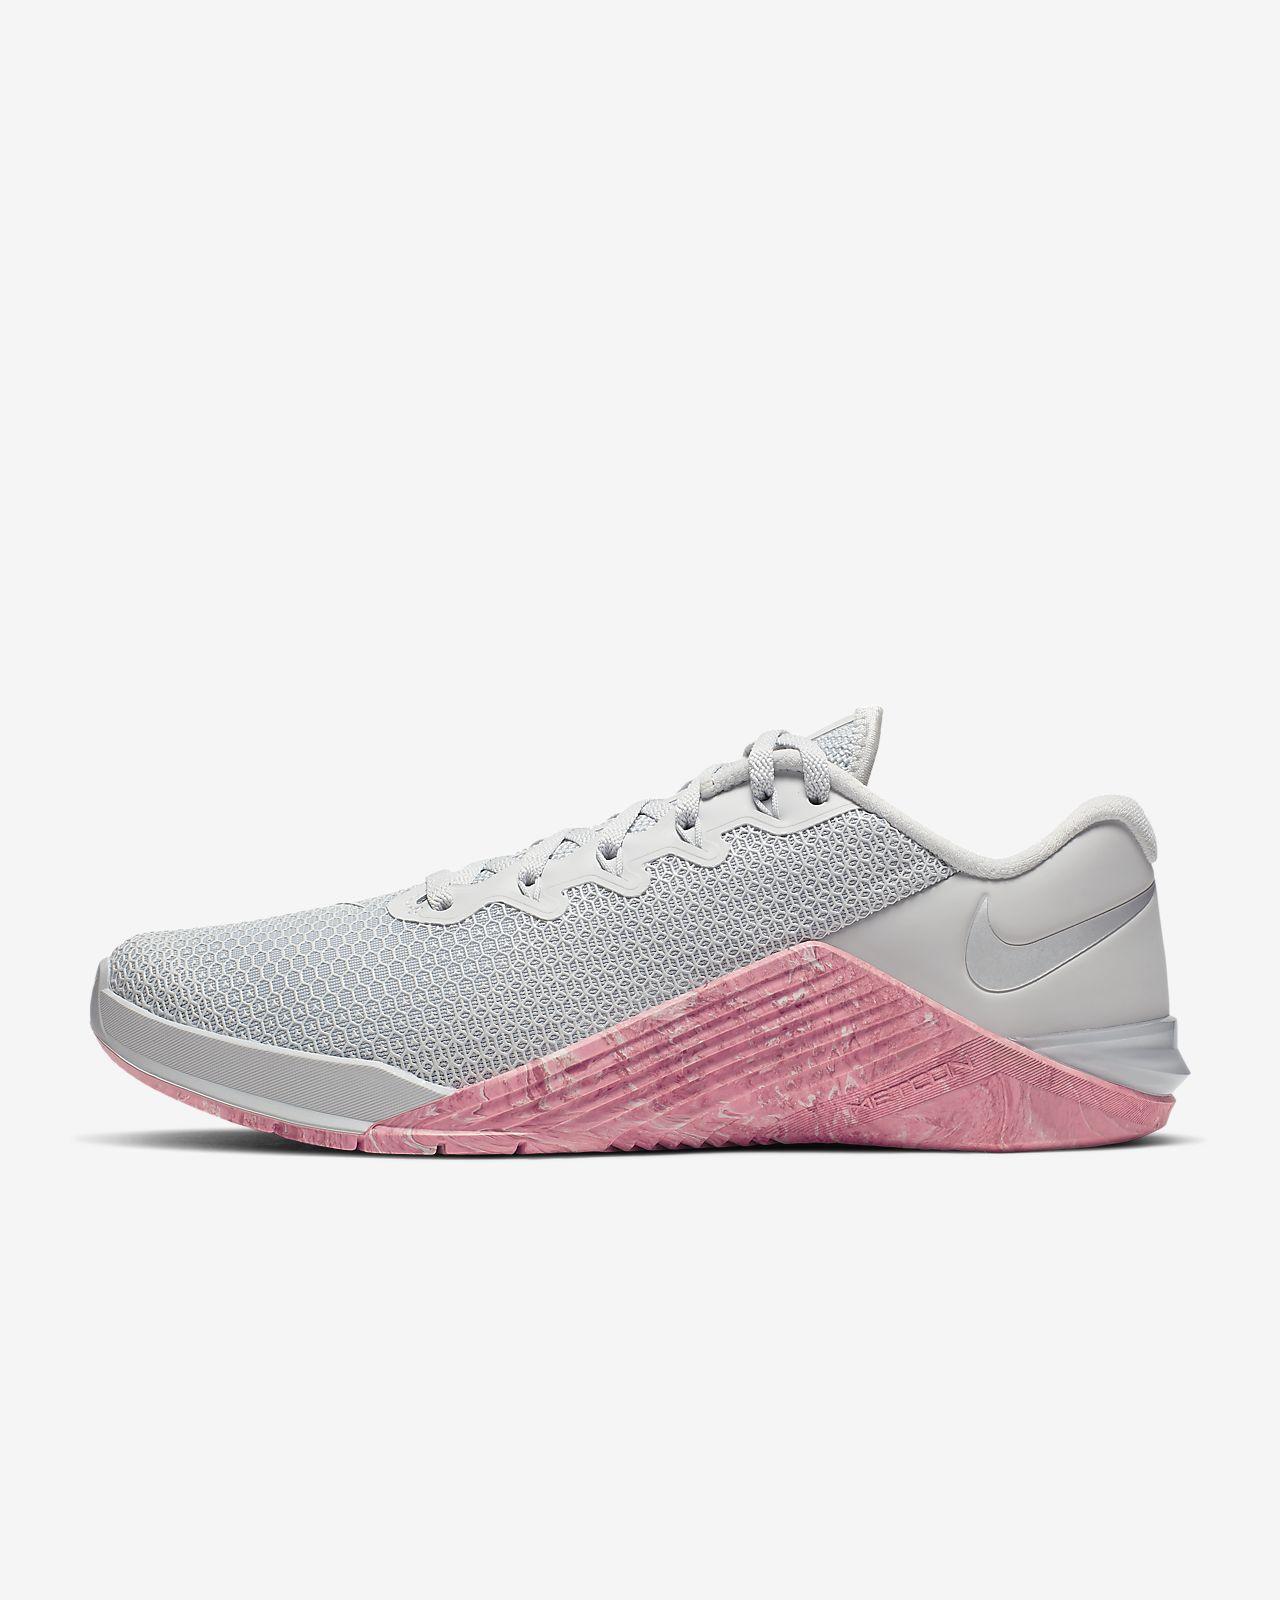 Damskie buty treningowe Nike Metcon 5